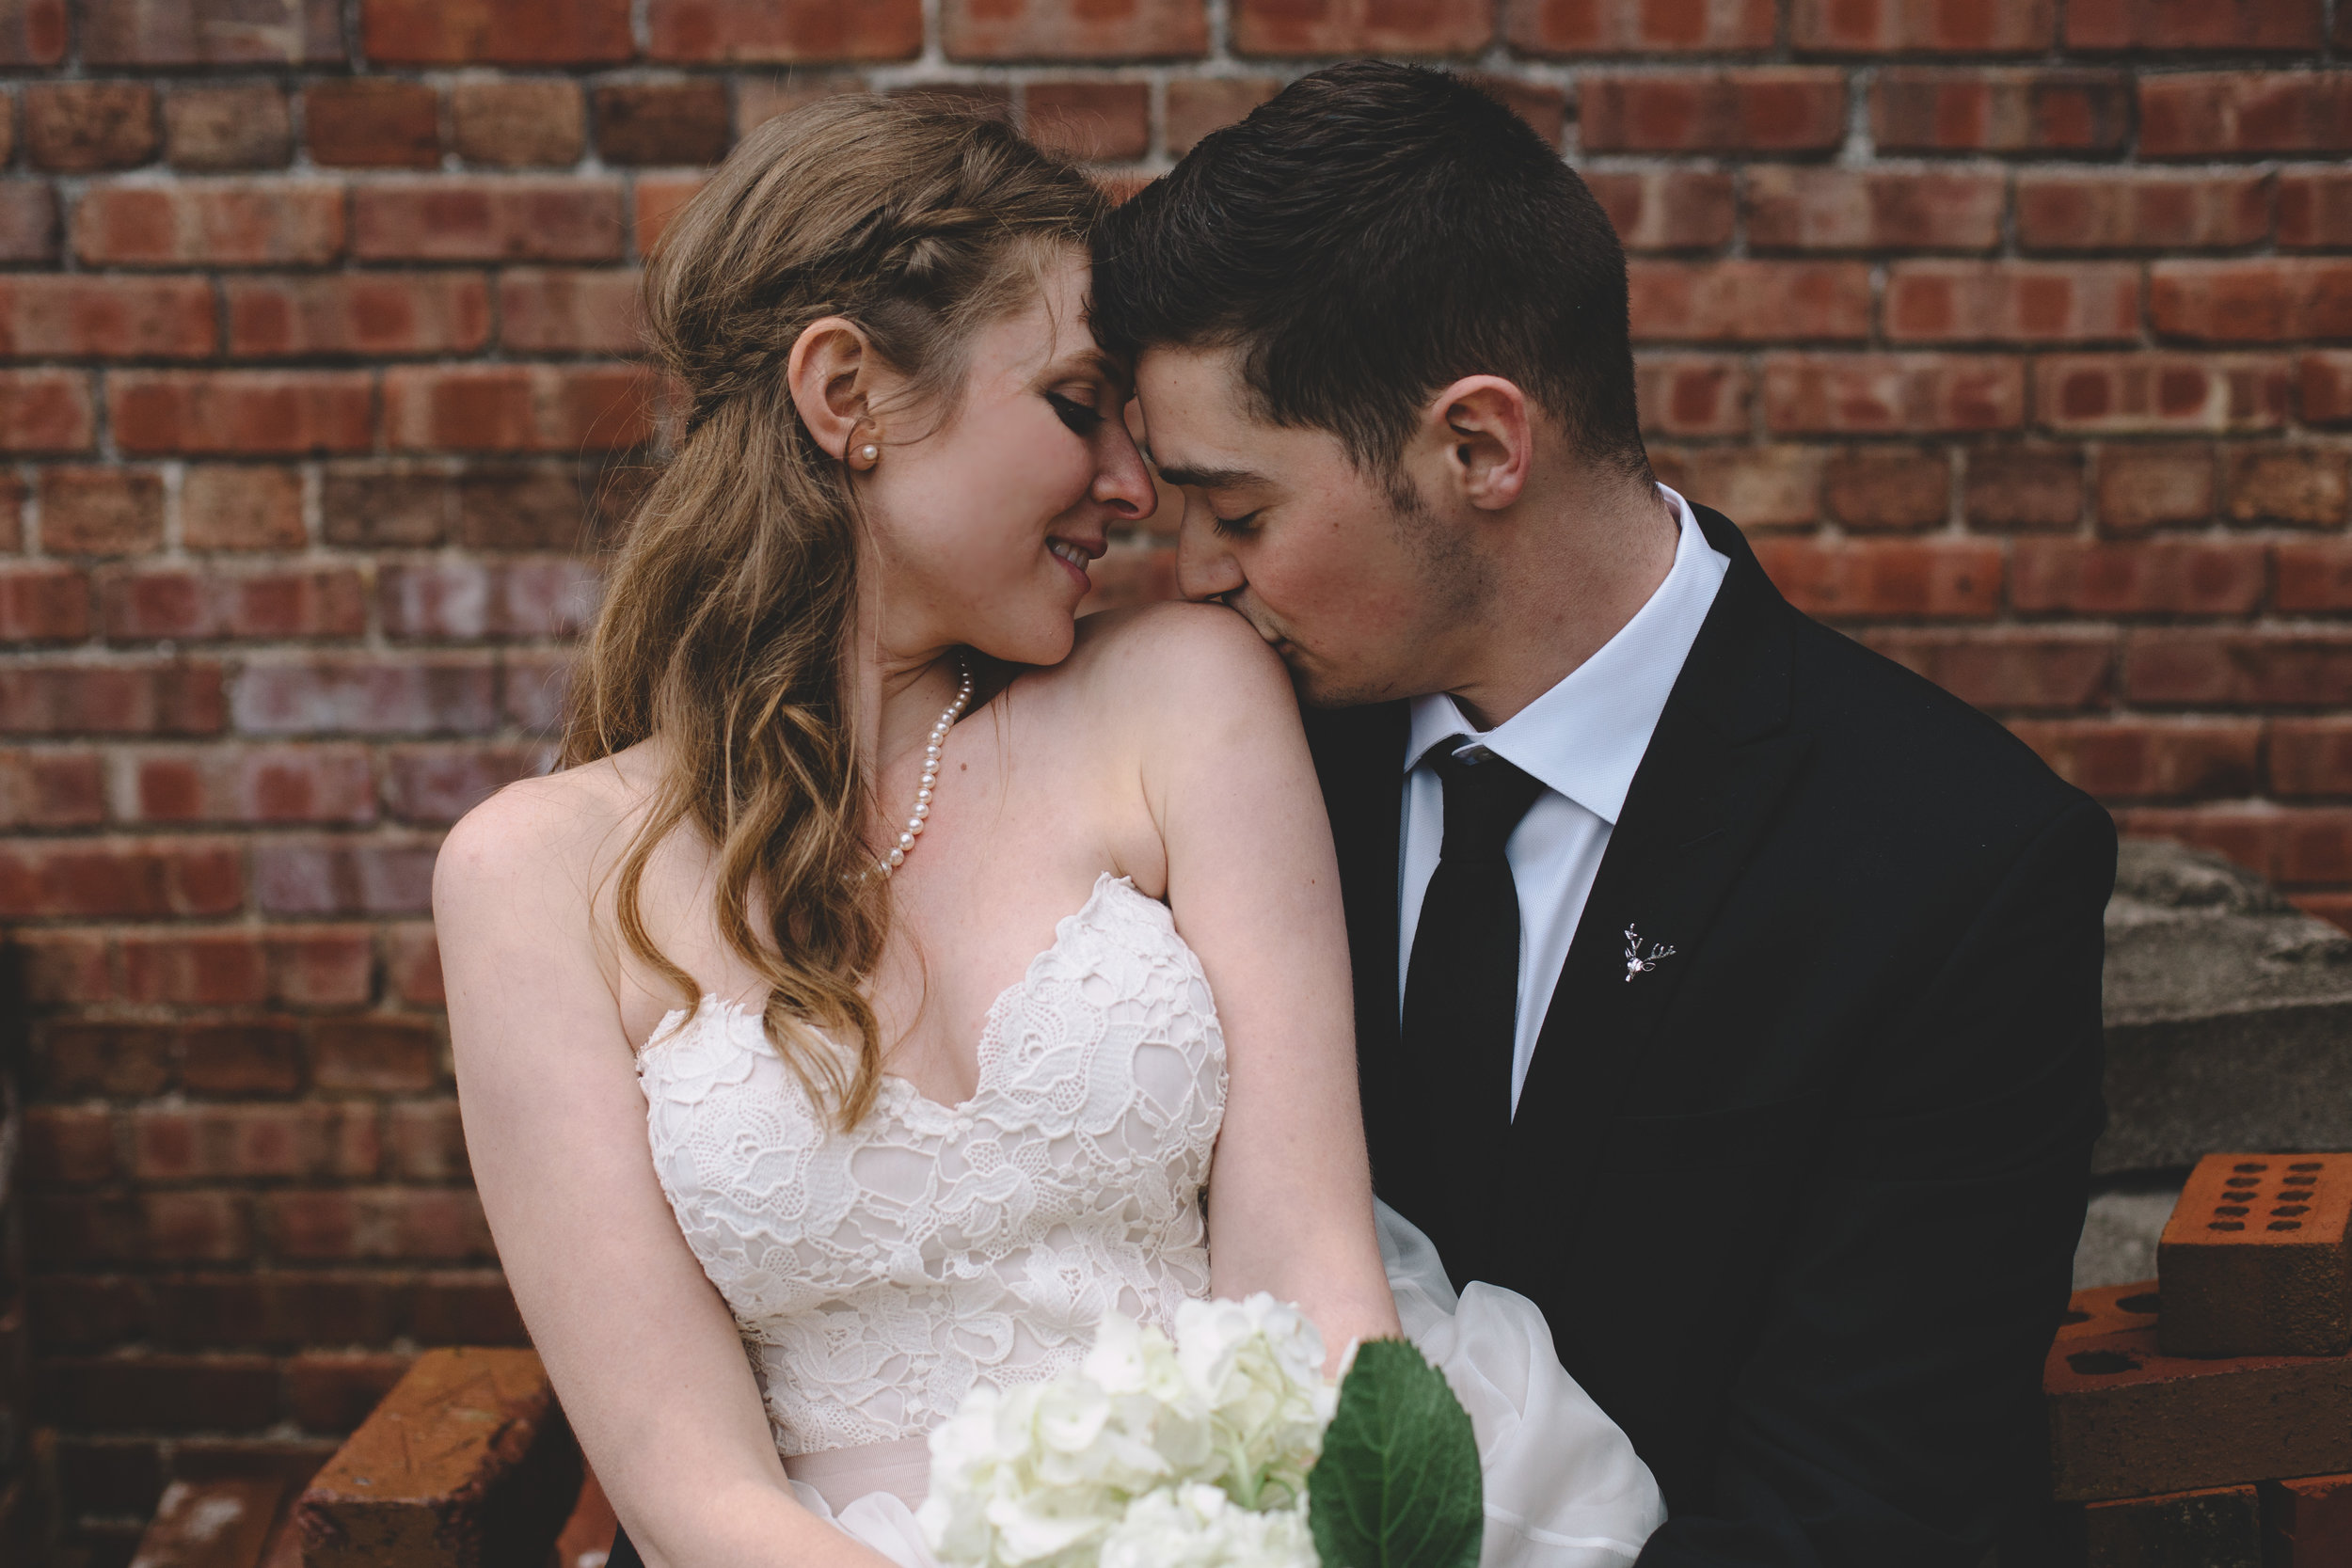 Jake + Brittney Balbas Airbnb Carriage House Wedding Evansville IN (319 of 426).jpg